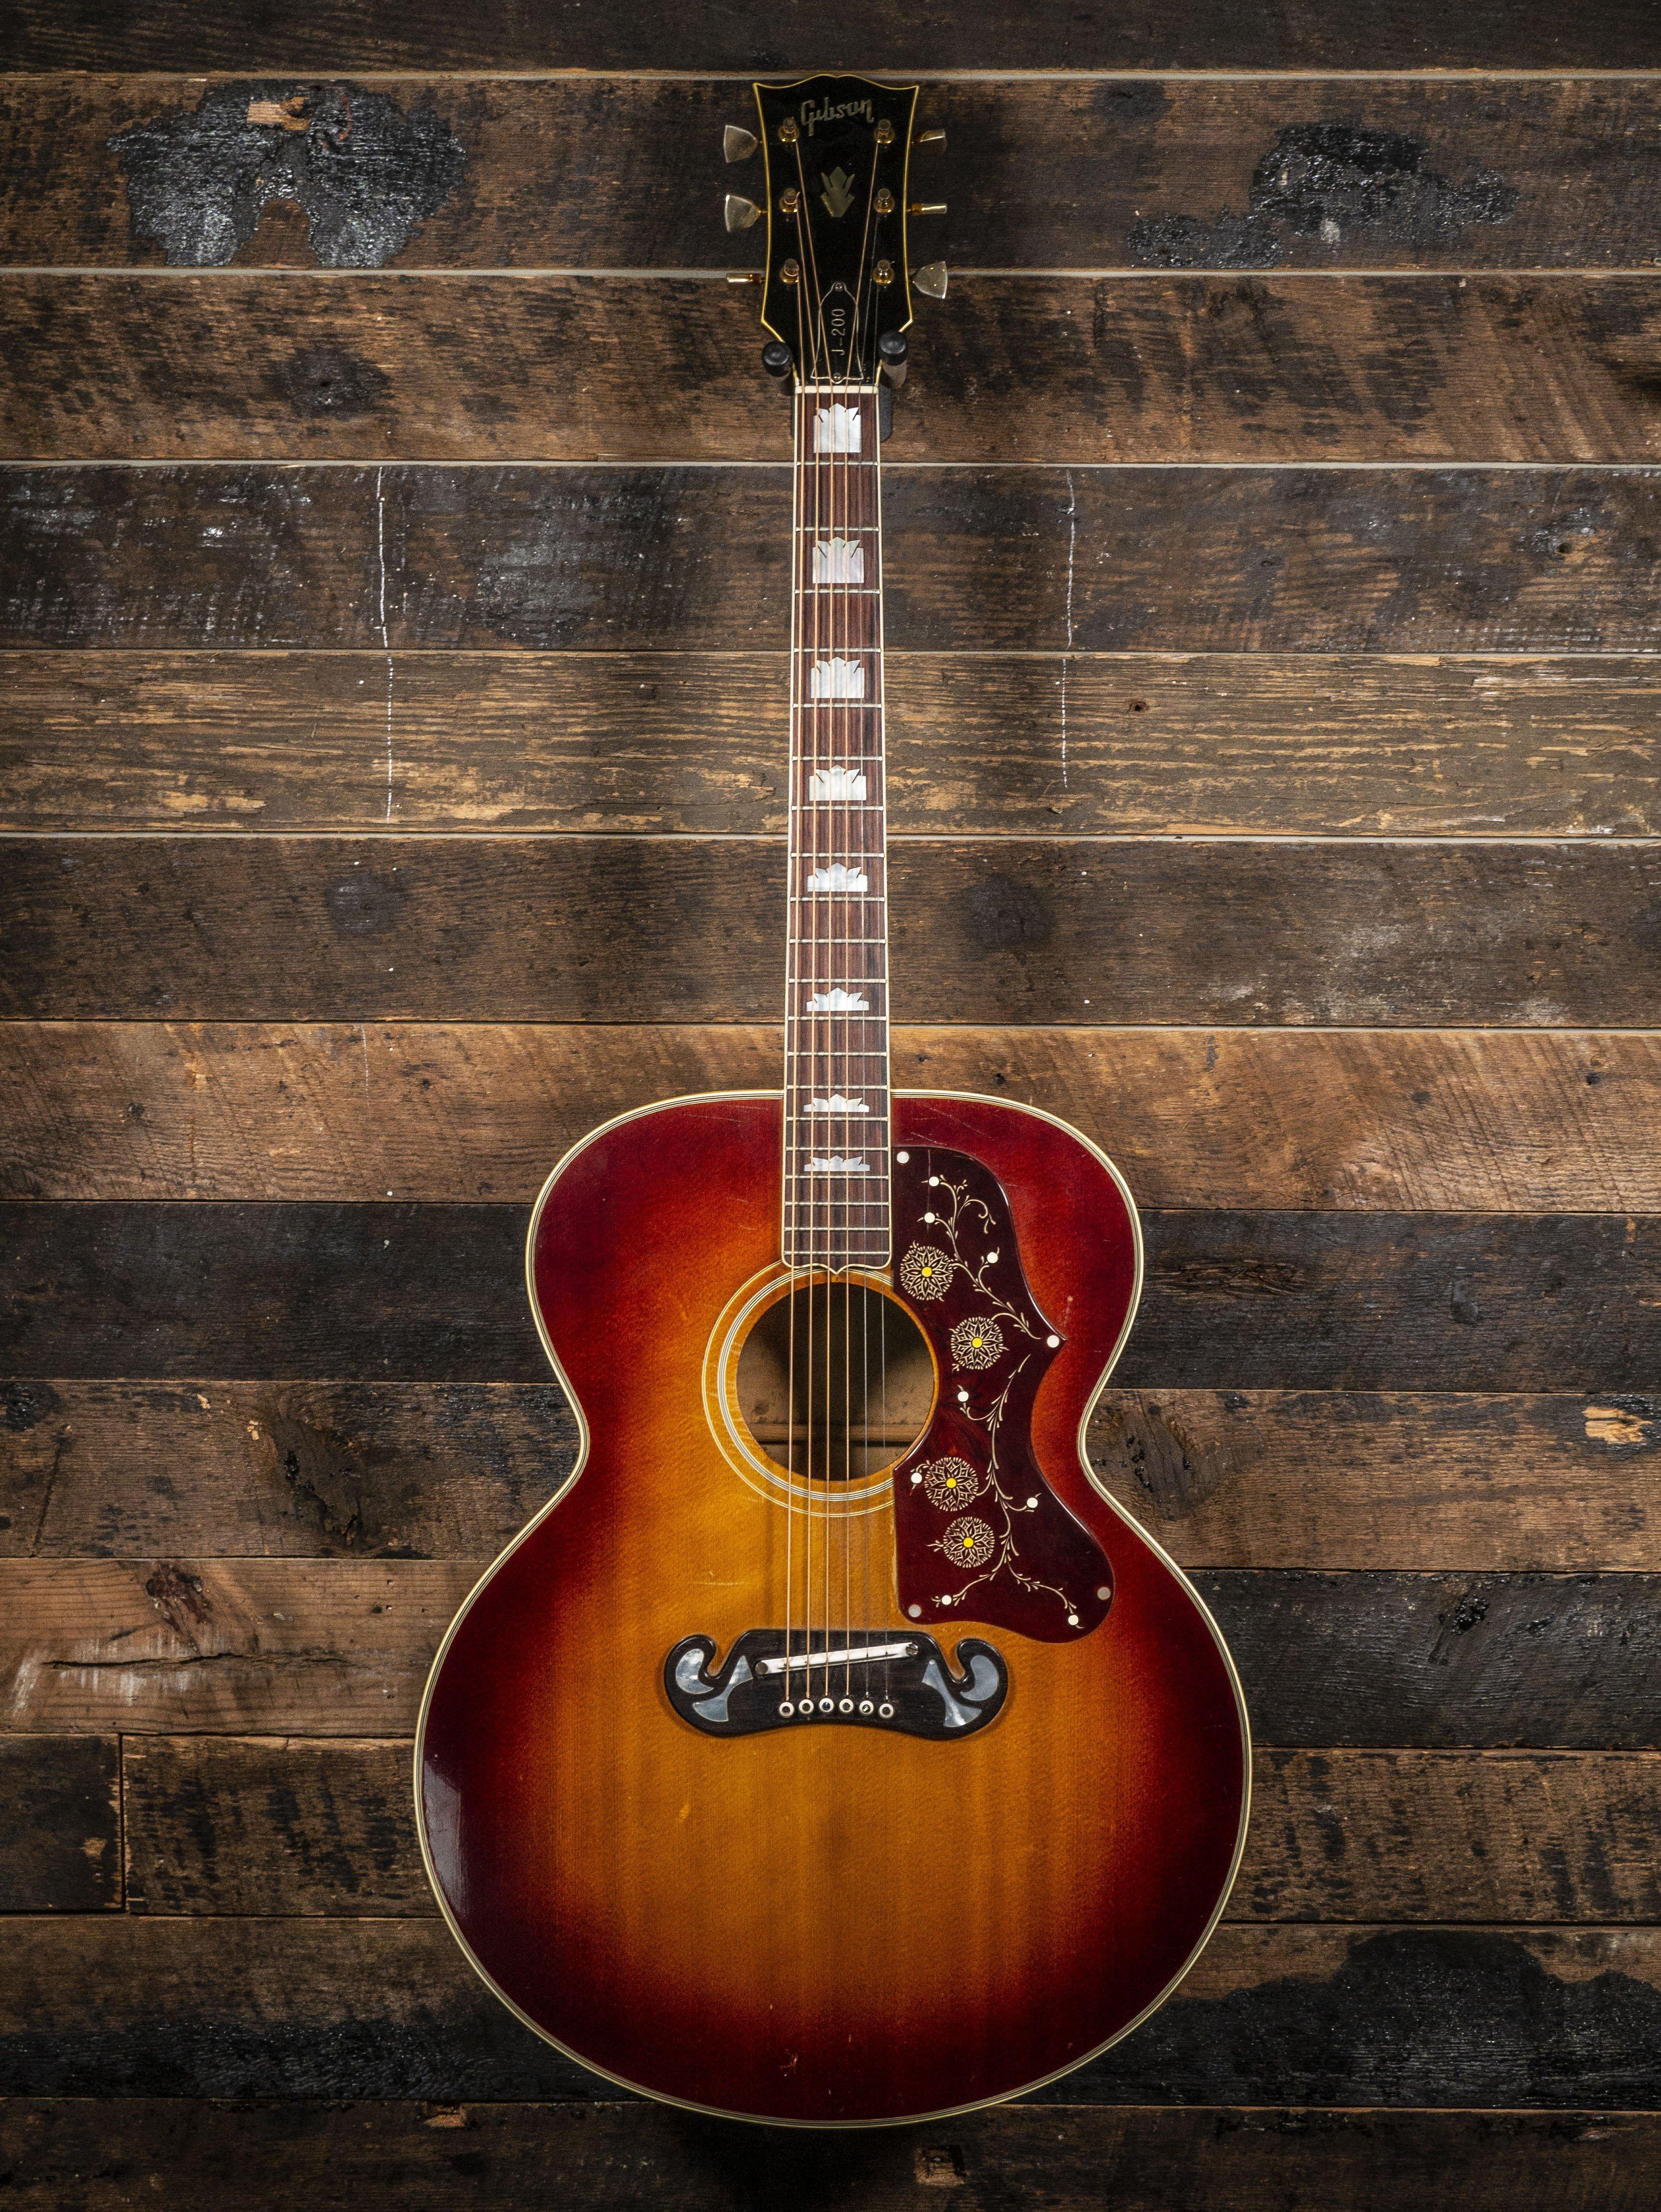 1968 Gibson J200